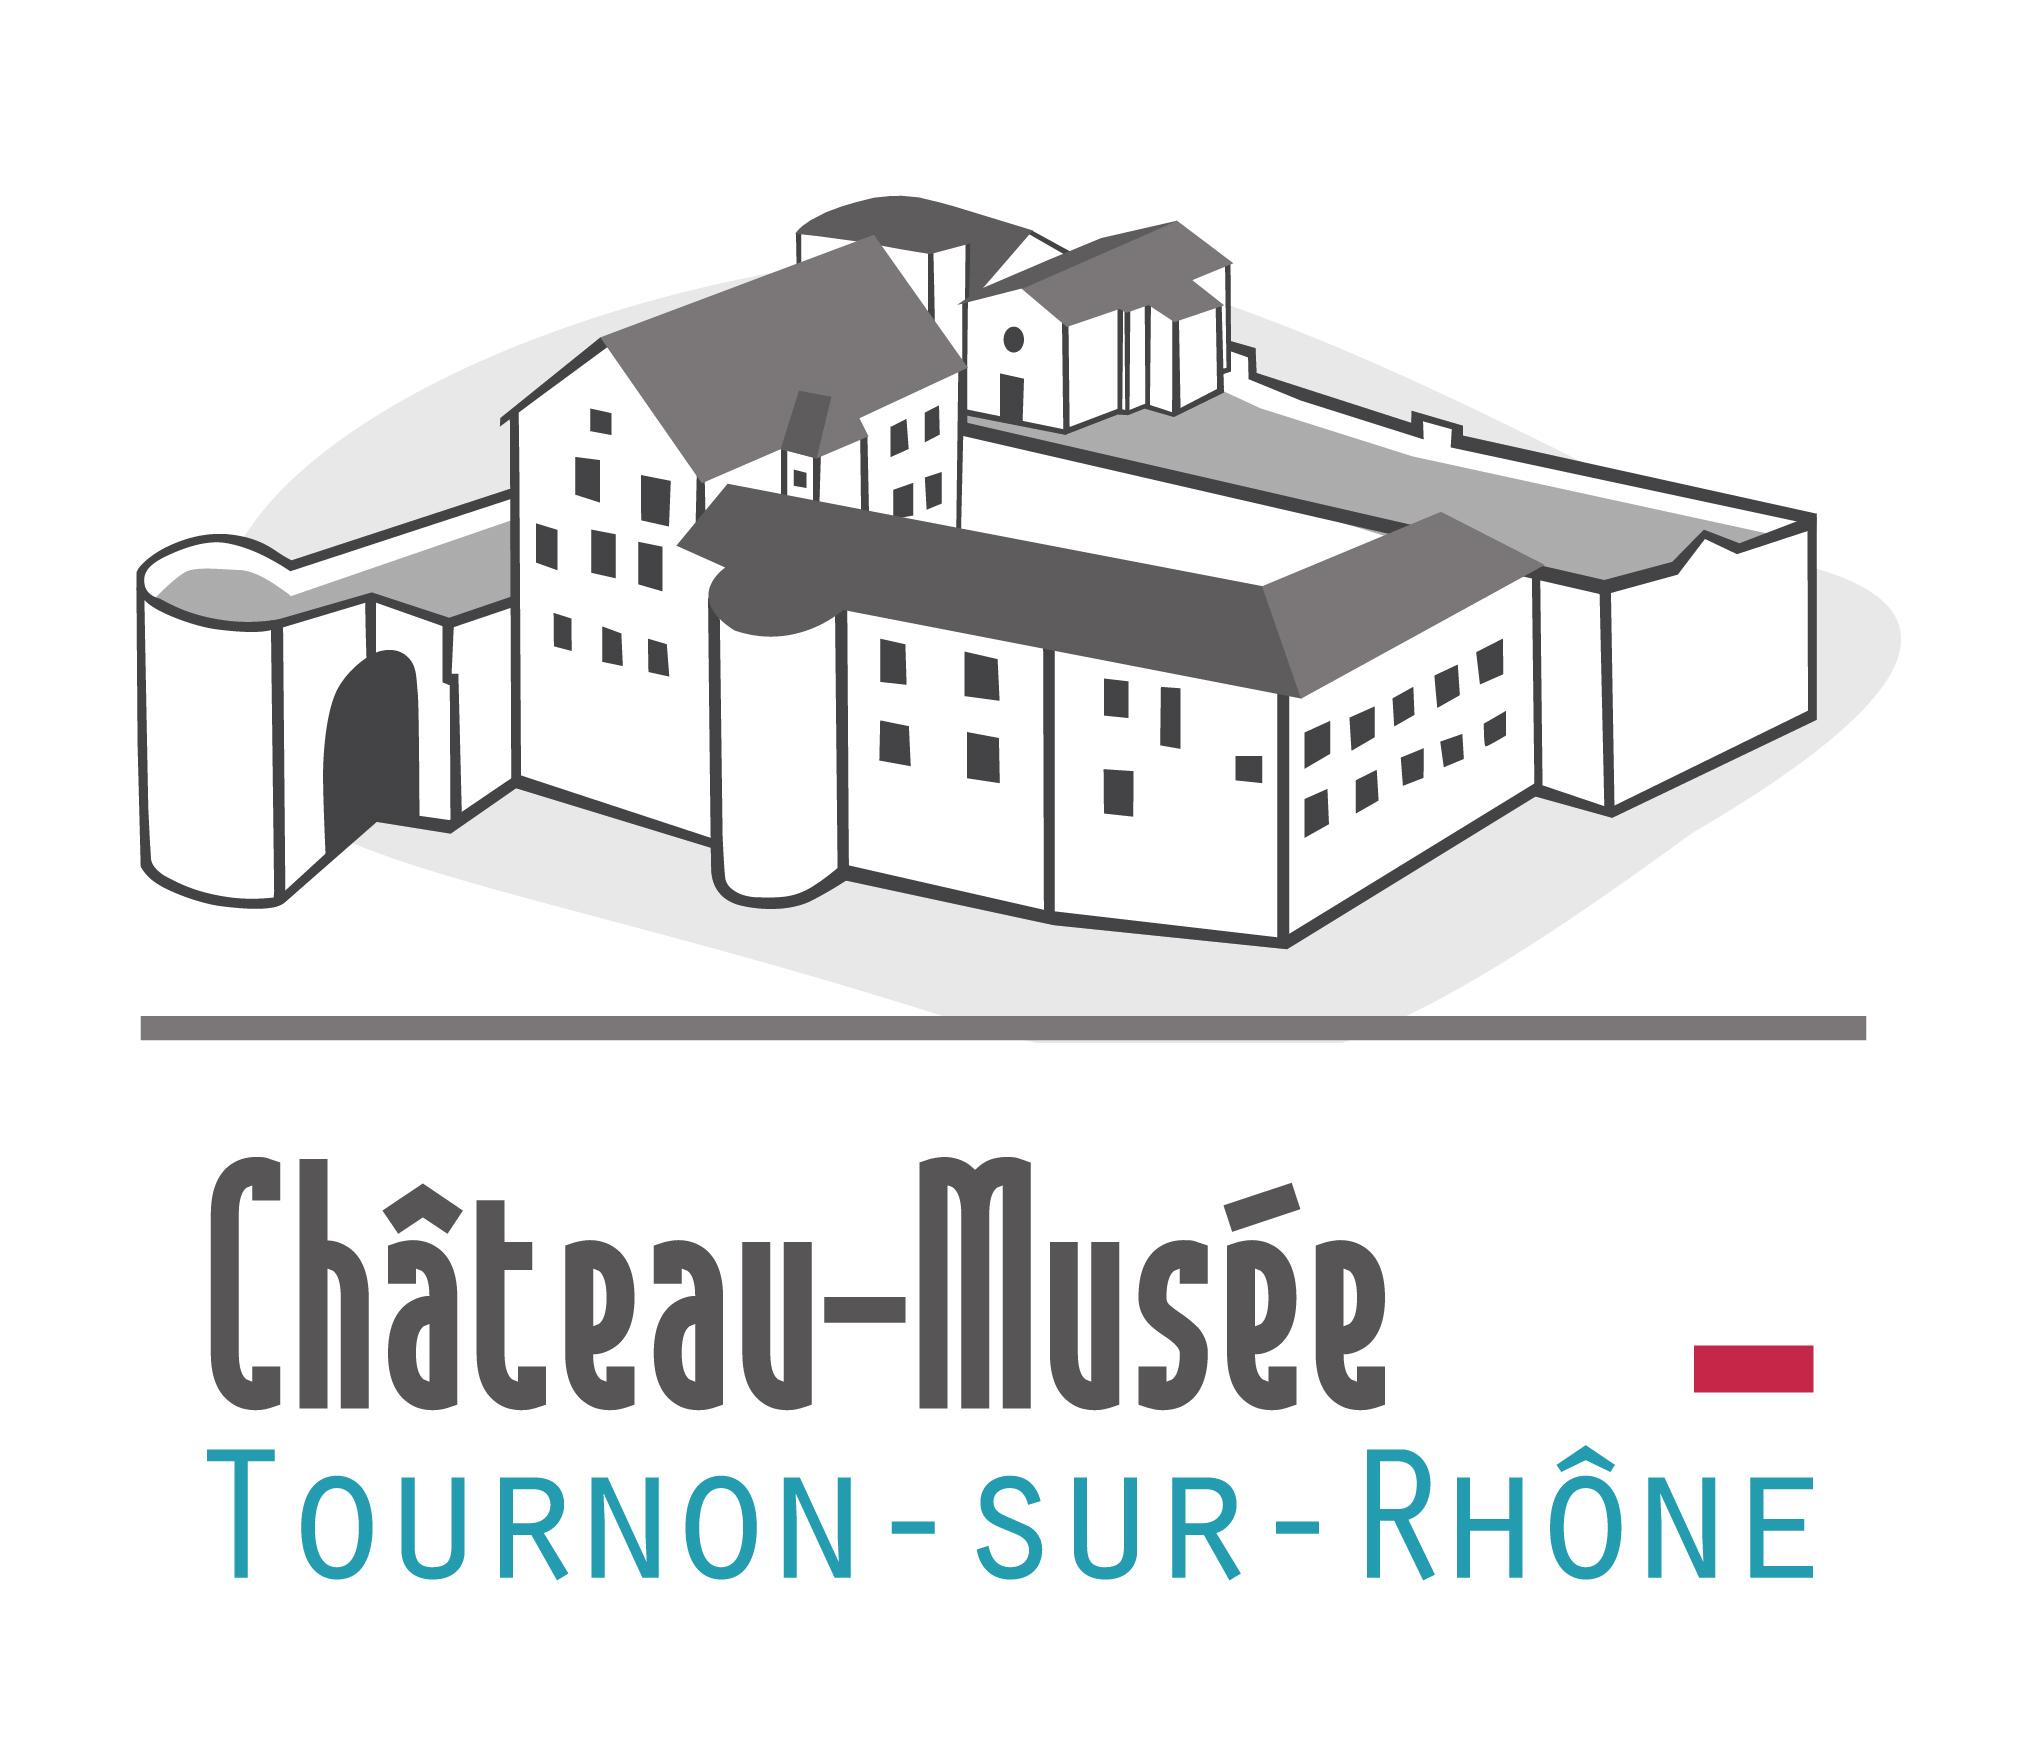 Château-musée Tournon